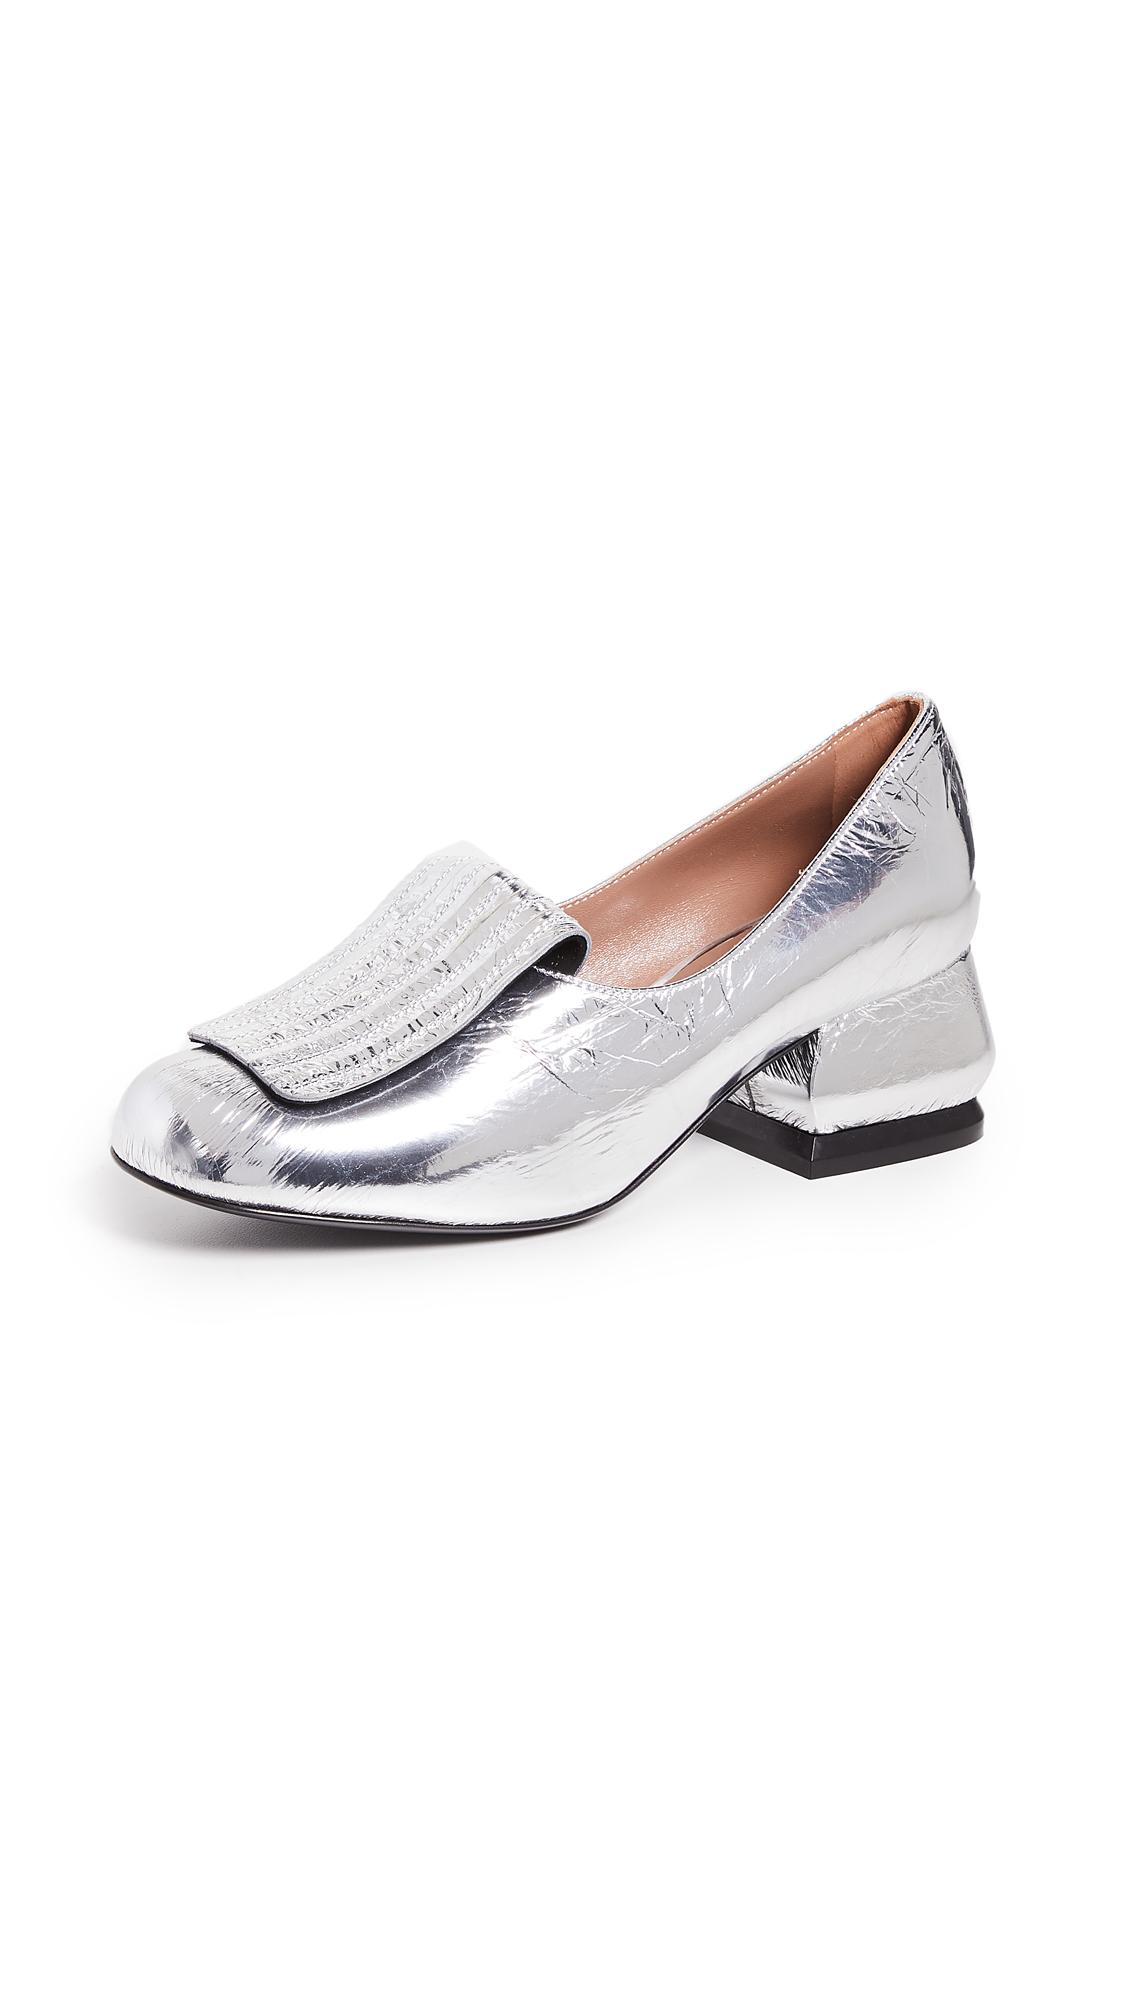 Marni Metallic Loafer Pumps - Silver